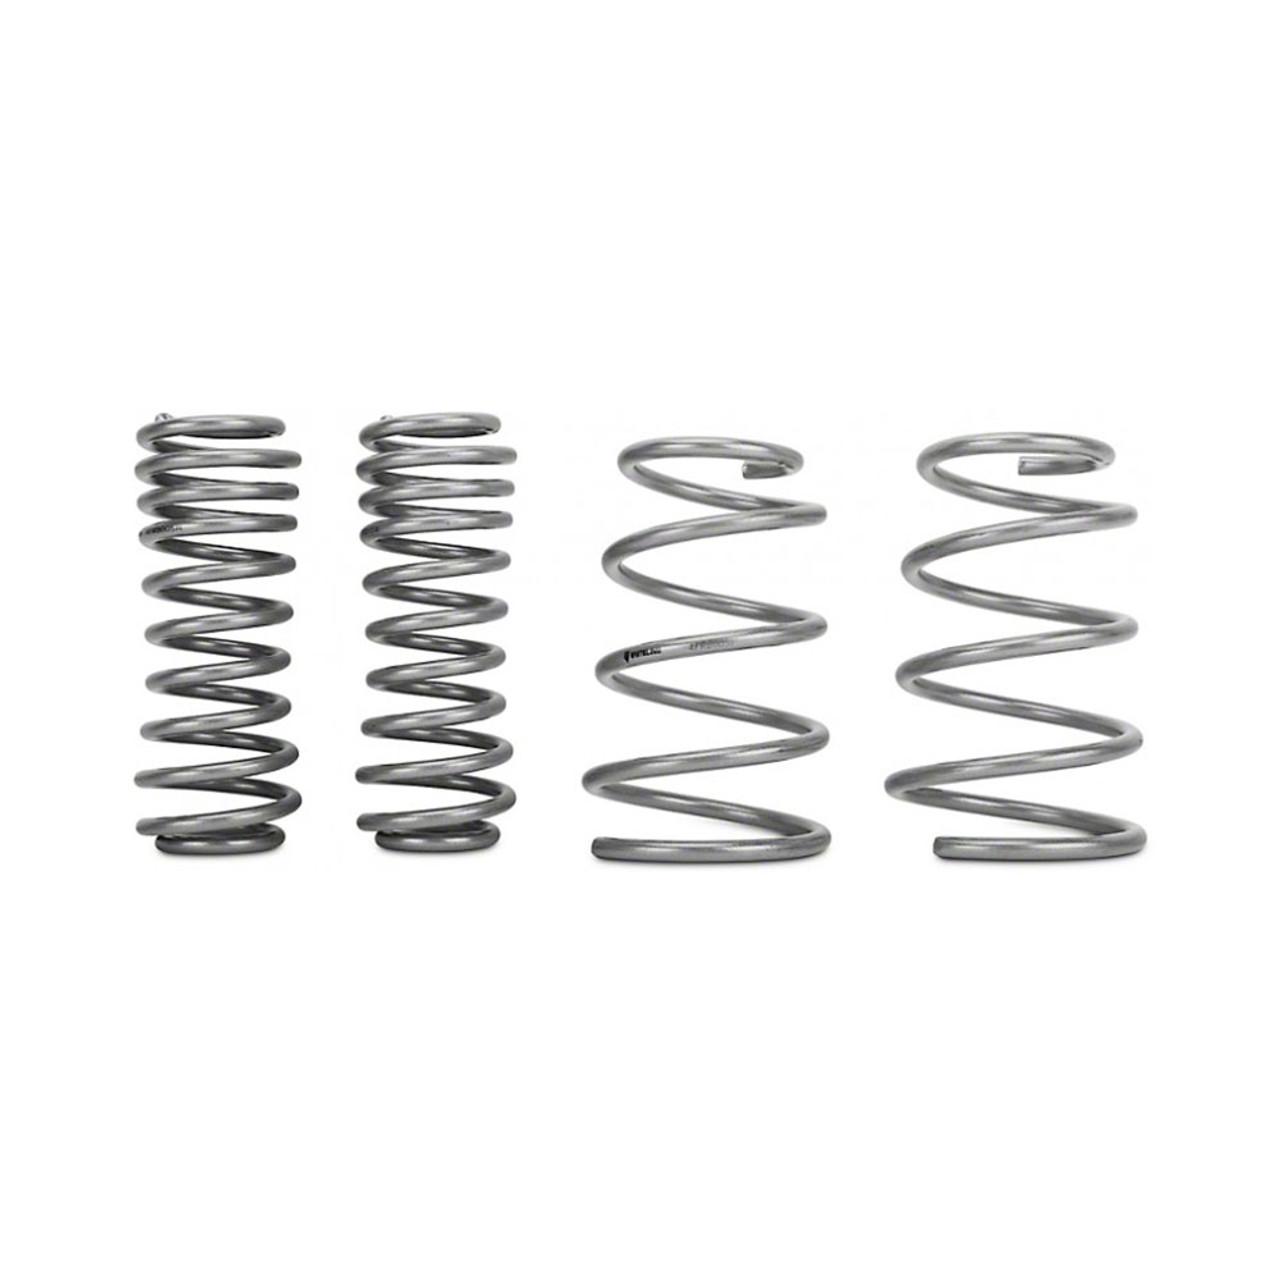 TRUHART THH LOWERING SPRINGS ACURA INTEGRA - Acura integra lowering springs